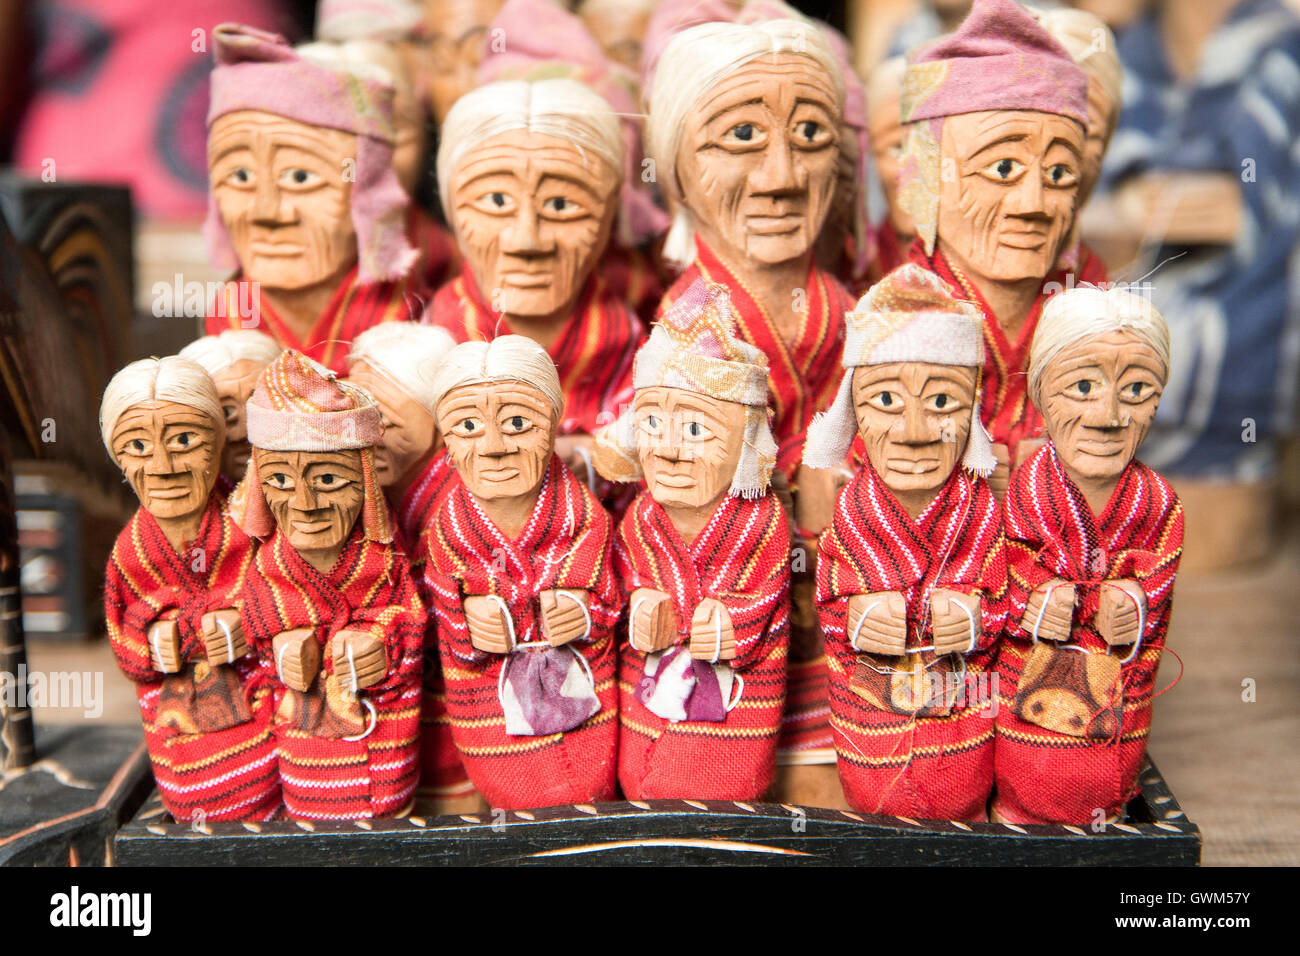 :Tau Tau in the burial sites of Toraja. Tau Tau is a replica of the Toraja people - Stock Image